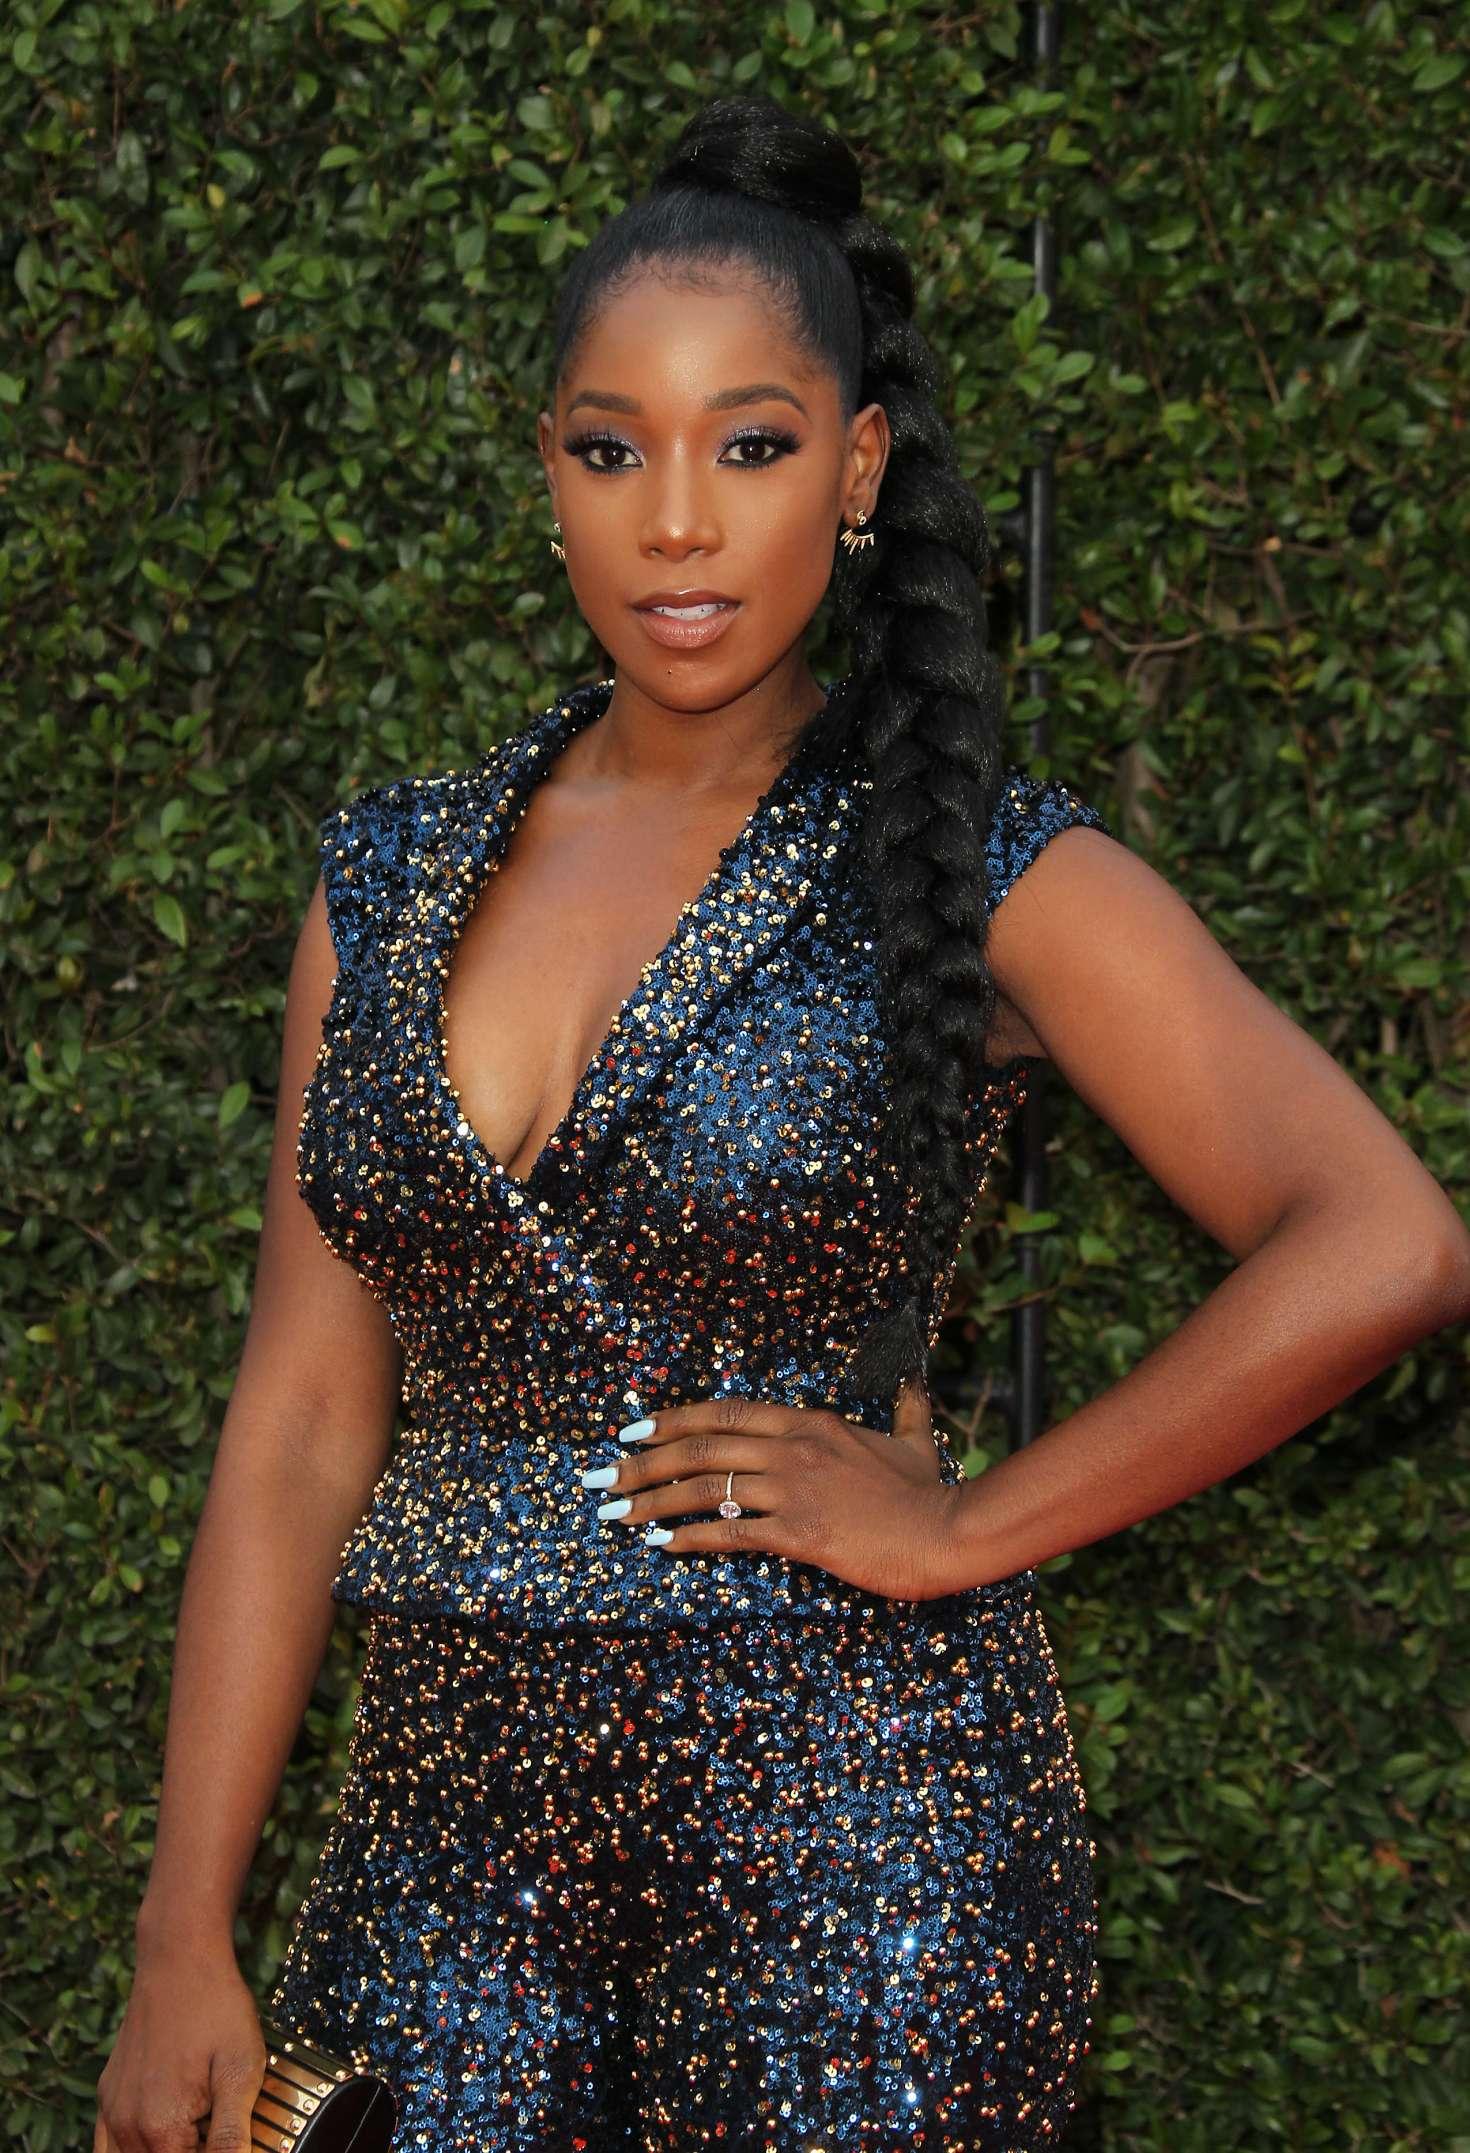 Ashley Blaine - 49th NAACP Image Awards in Pasadena